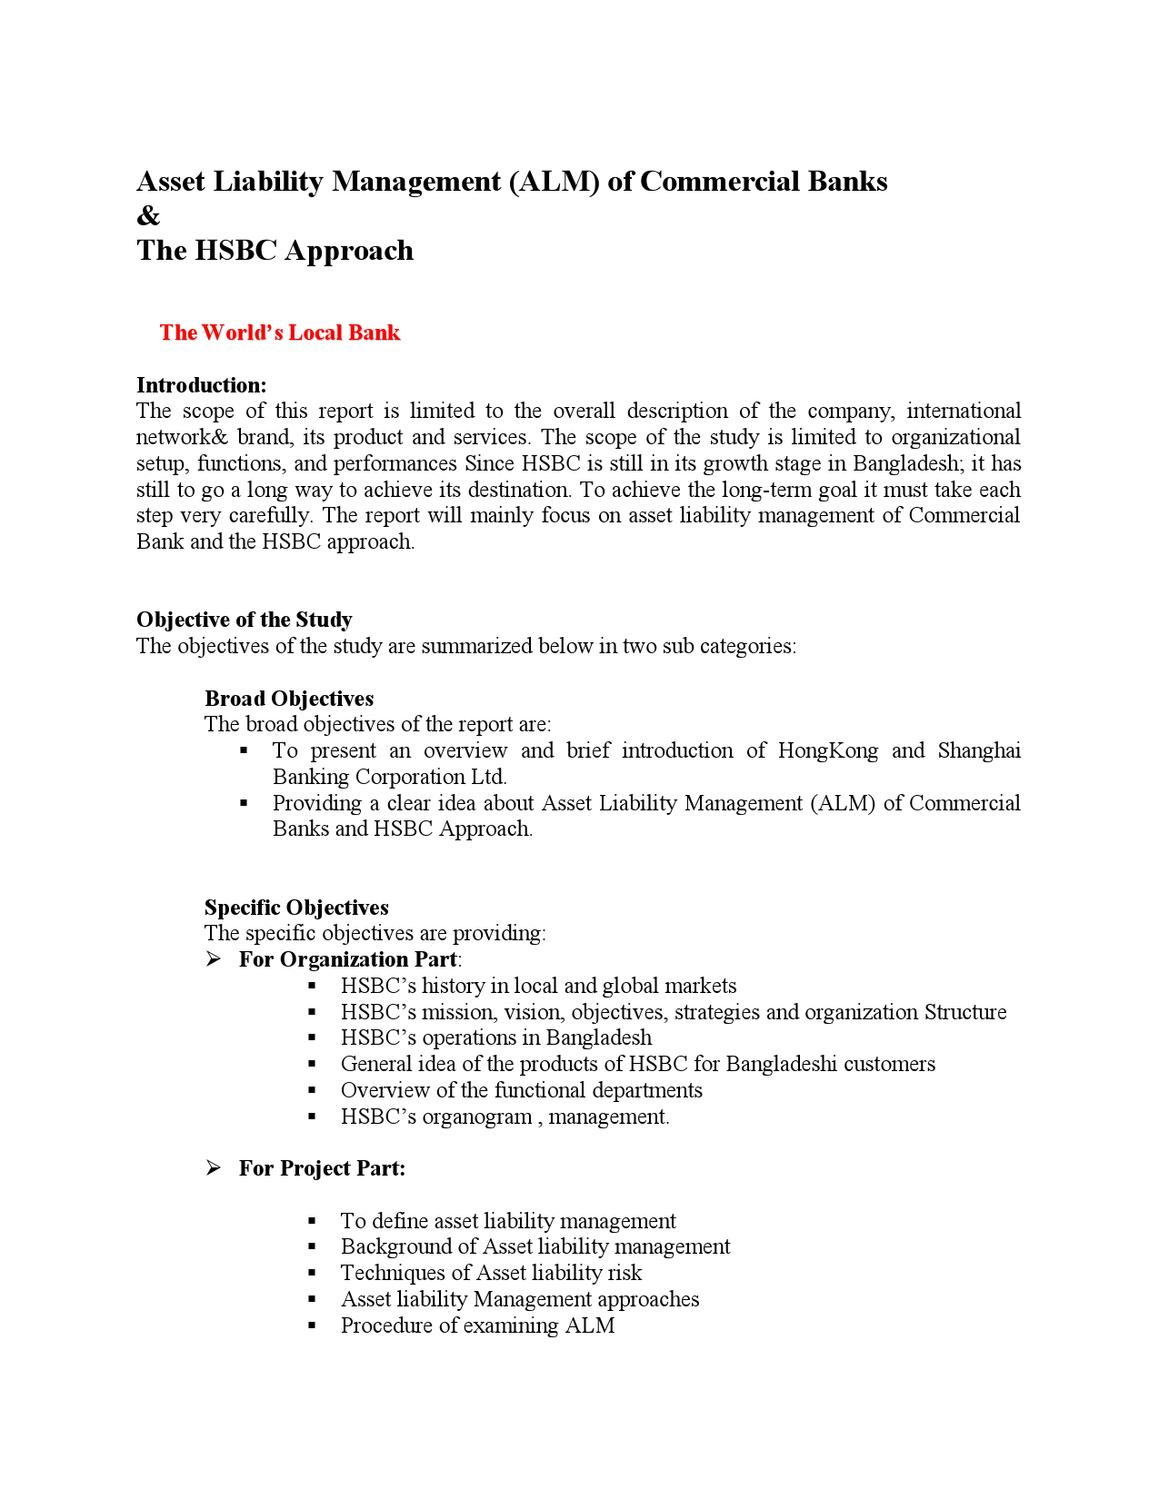 hsbc asset liability management by zahid hossain issuu - World Vision Organizational Structure